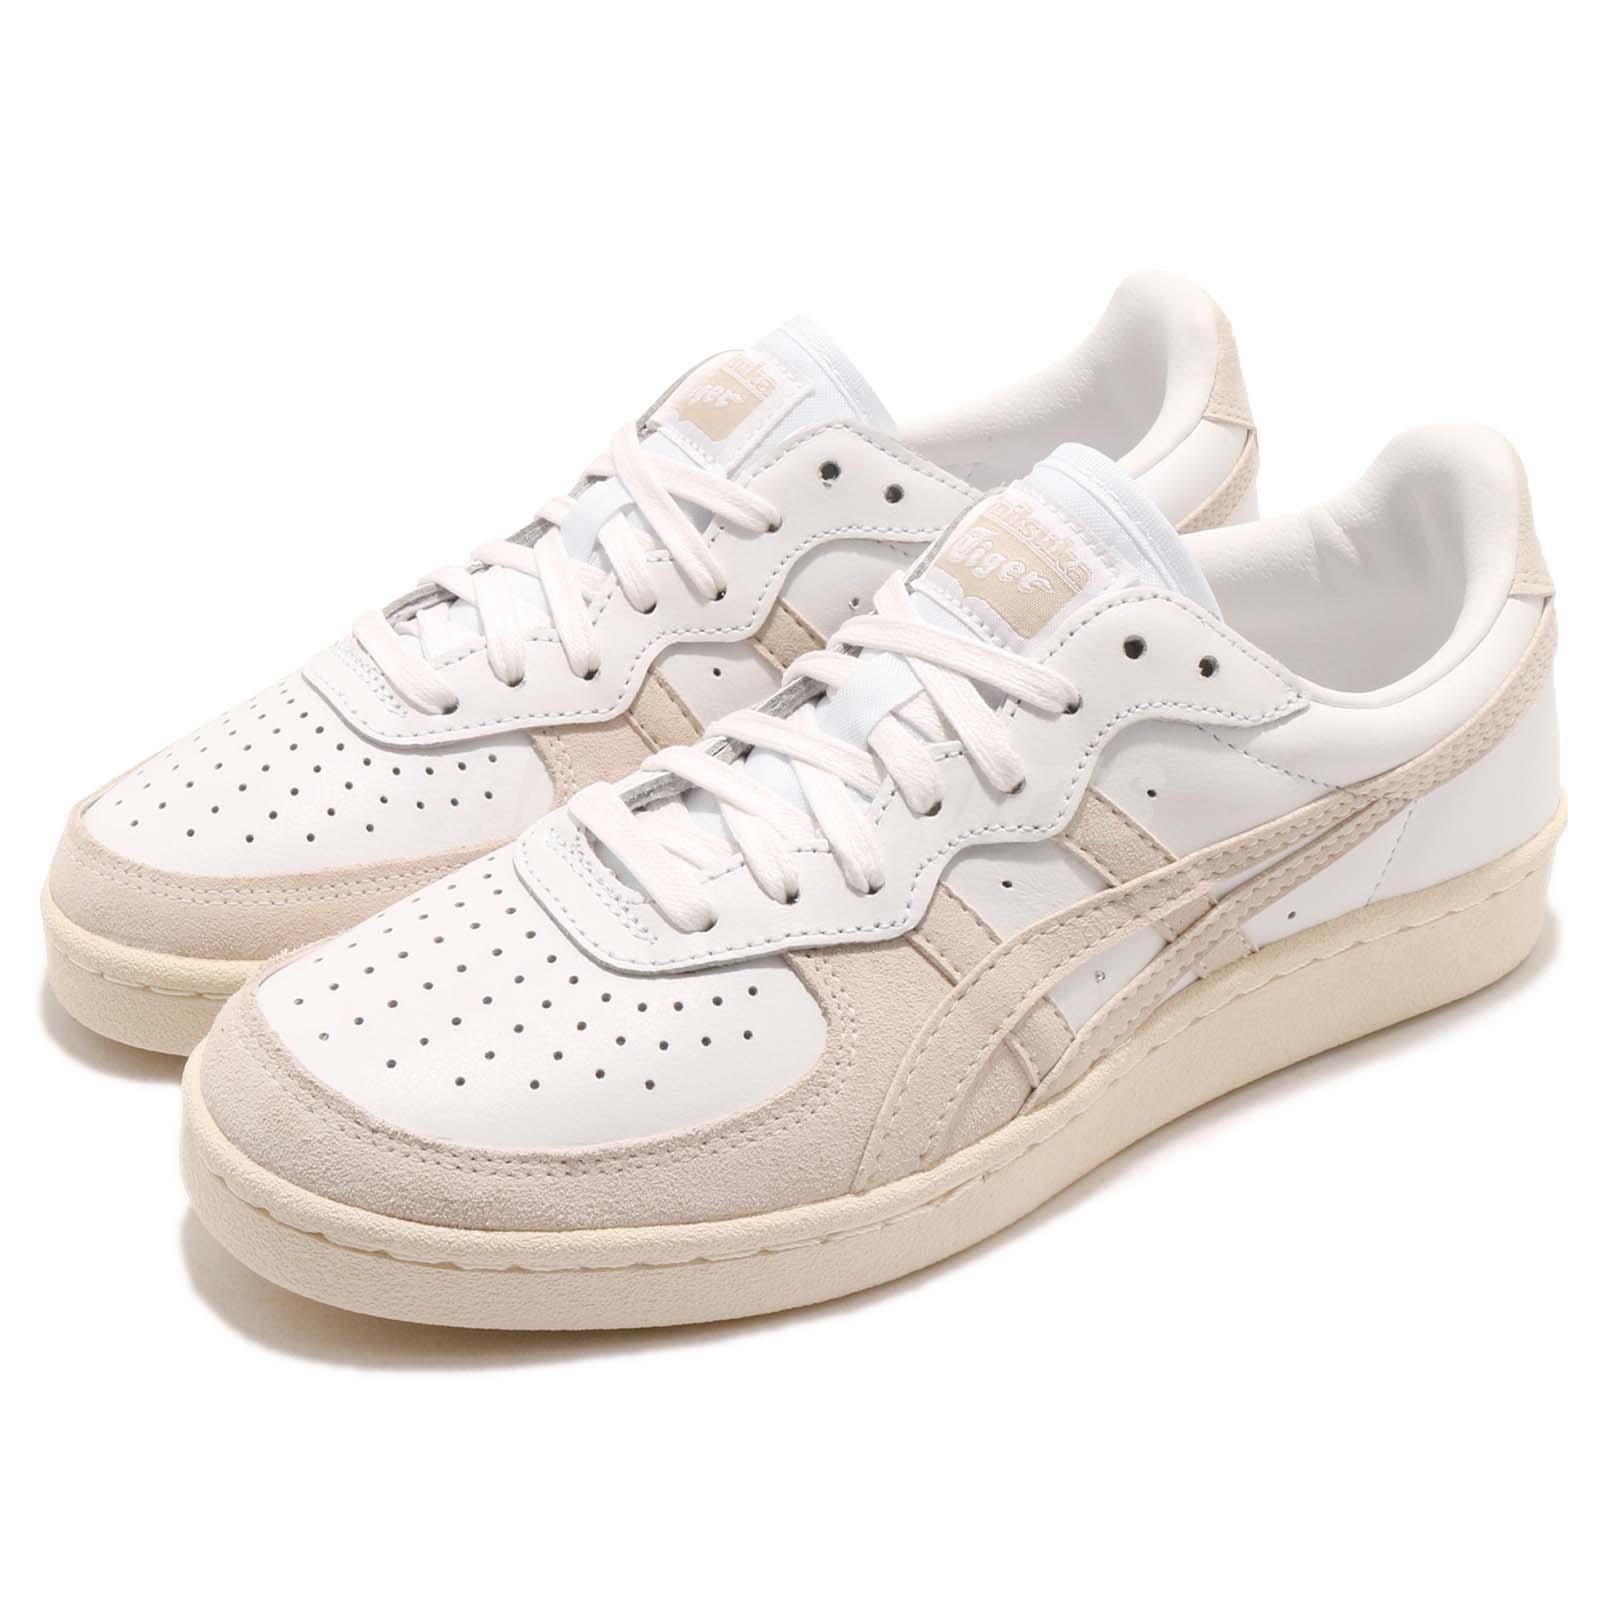 Extensamente Decorar Roux  Asics Onitsuka Tiger GSM White Beige Men Women Casual Shoes Sneakers  D6H1L-0101 | eBay